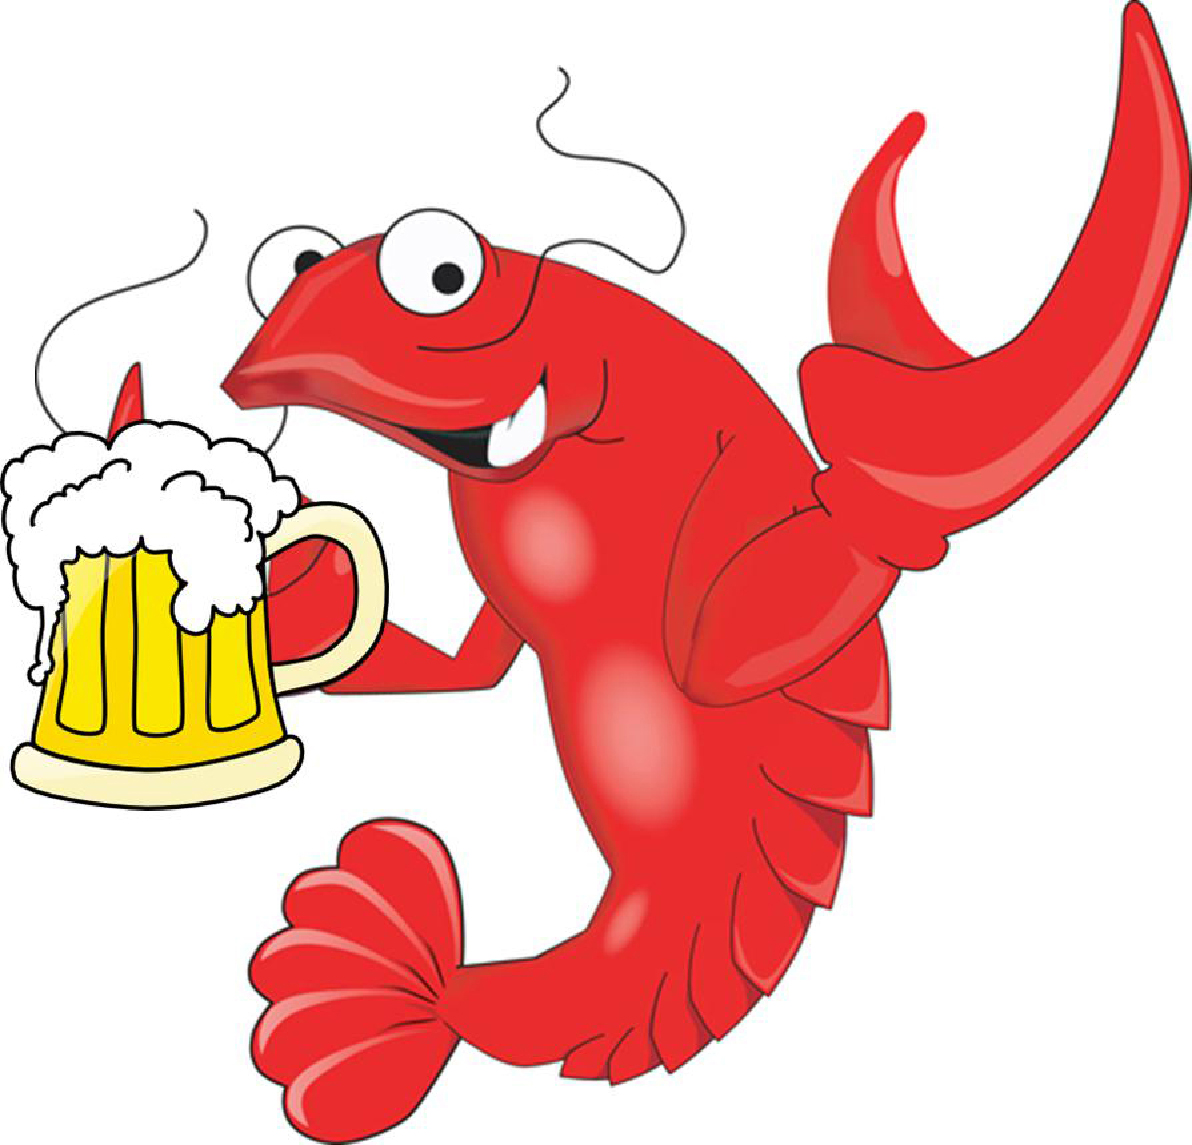 Boil Clip Art Crawfish Clip Art Crawfish Clip Art Crawfish Boil Clip